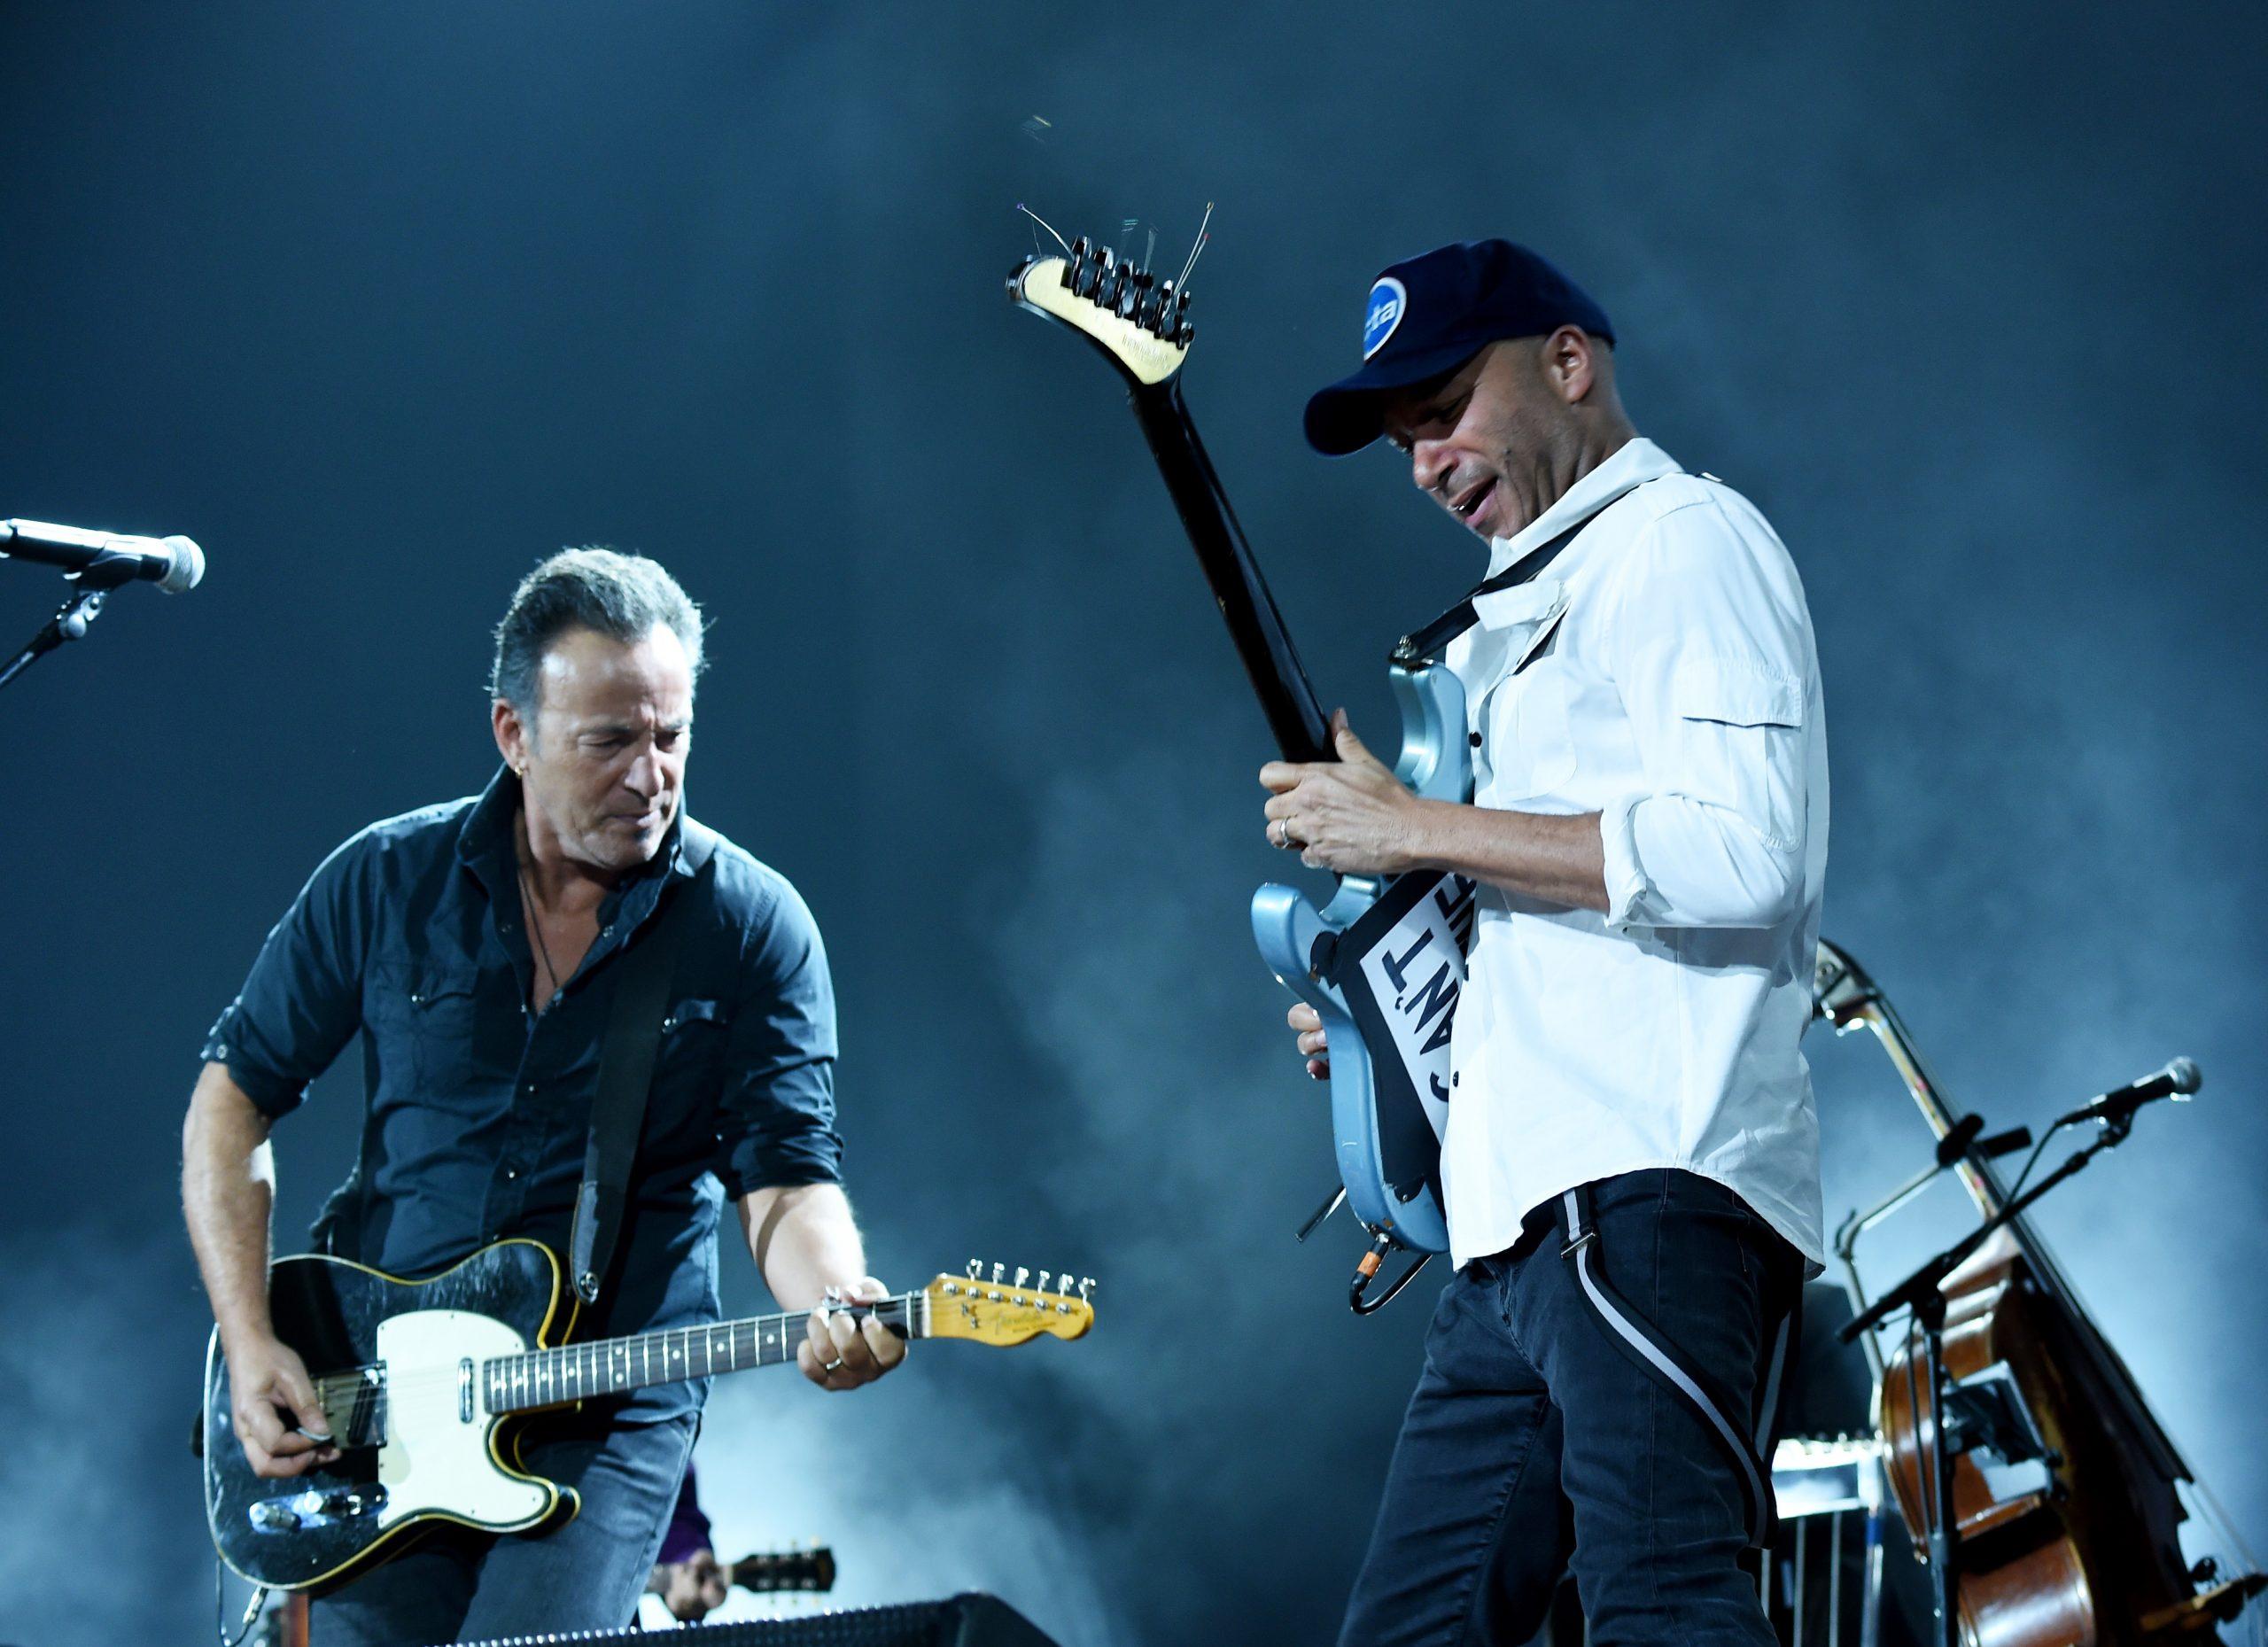 Checa a Tom Morello, Eddie Vedder y Bruce Springsteen covereando a AC/DC